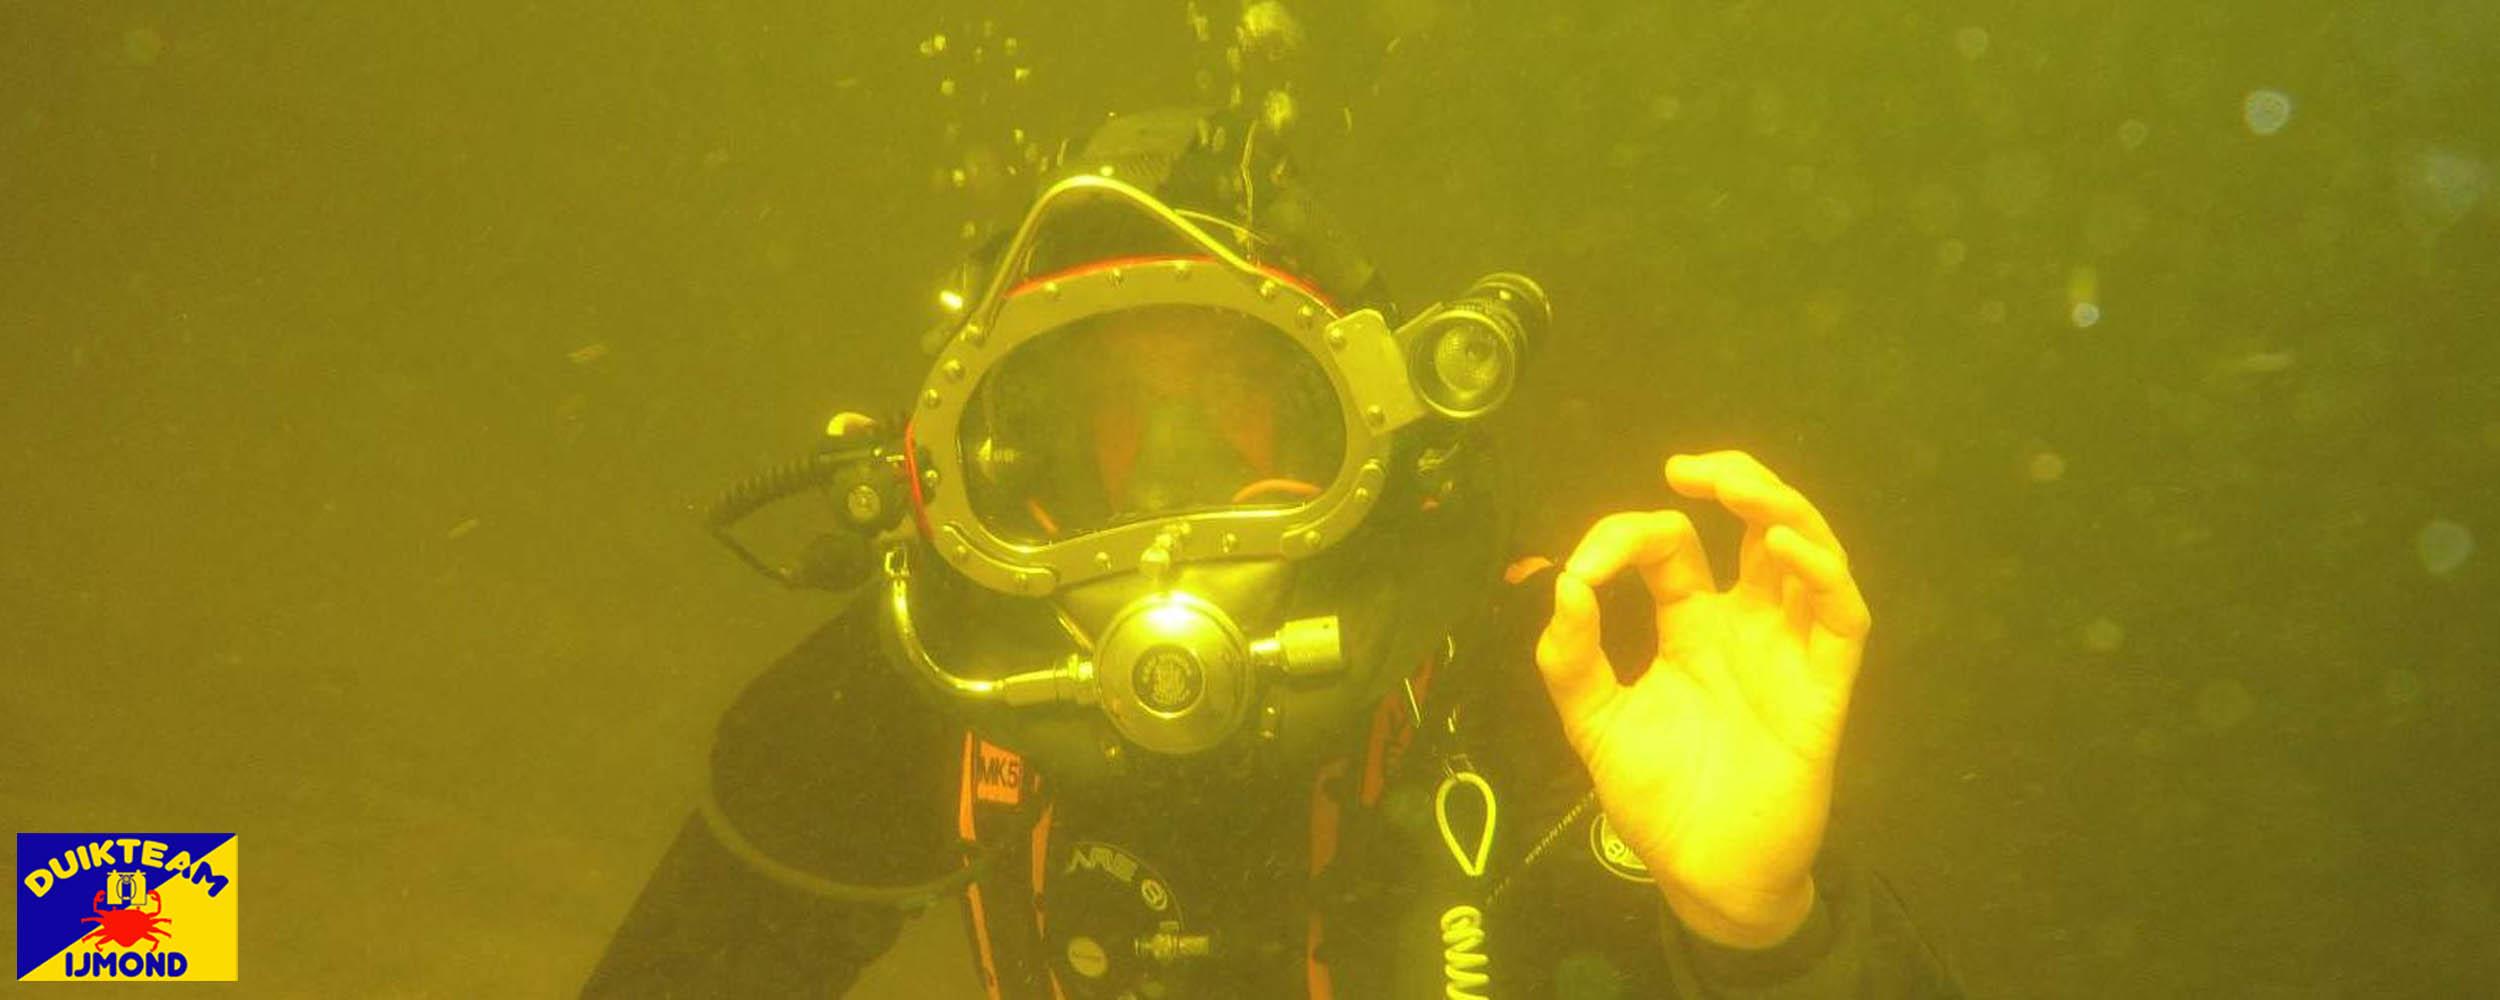 helmduiker met kirby morgan van duikteam ijmond onderwater